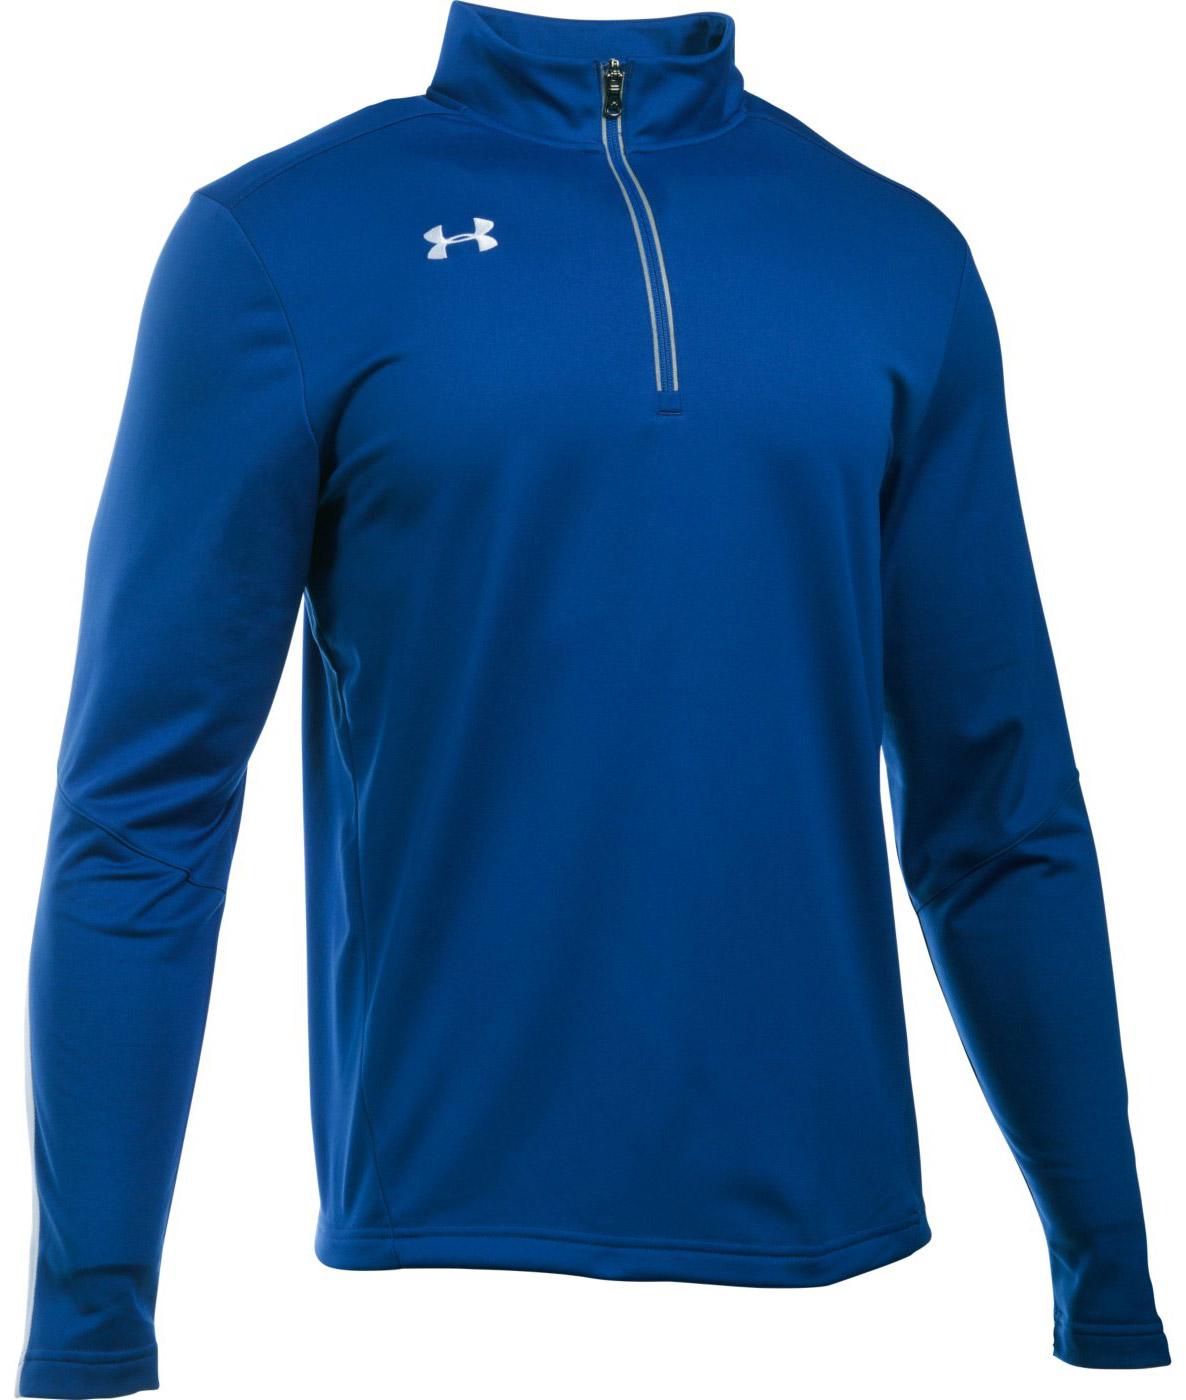 Under armour qualifier men 39 s 1 4 zip shirt for Under armour custom shirts